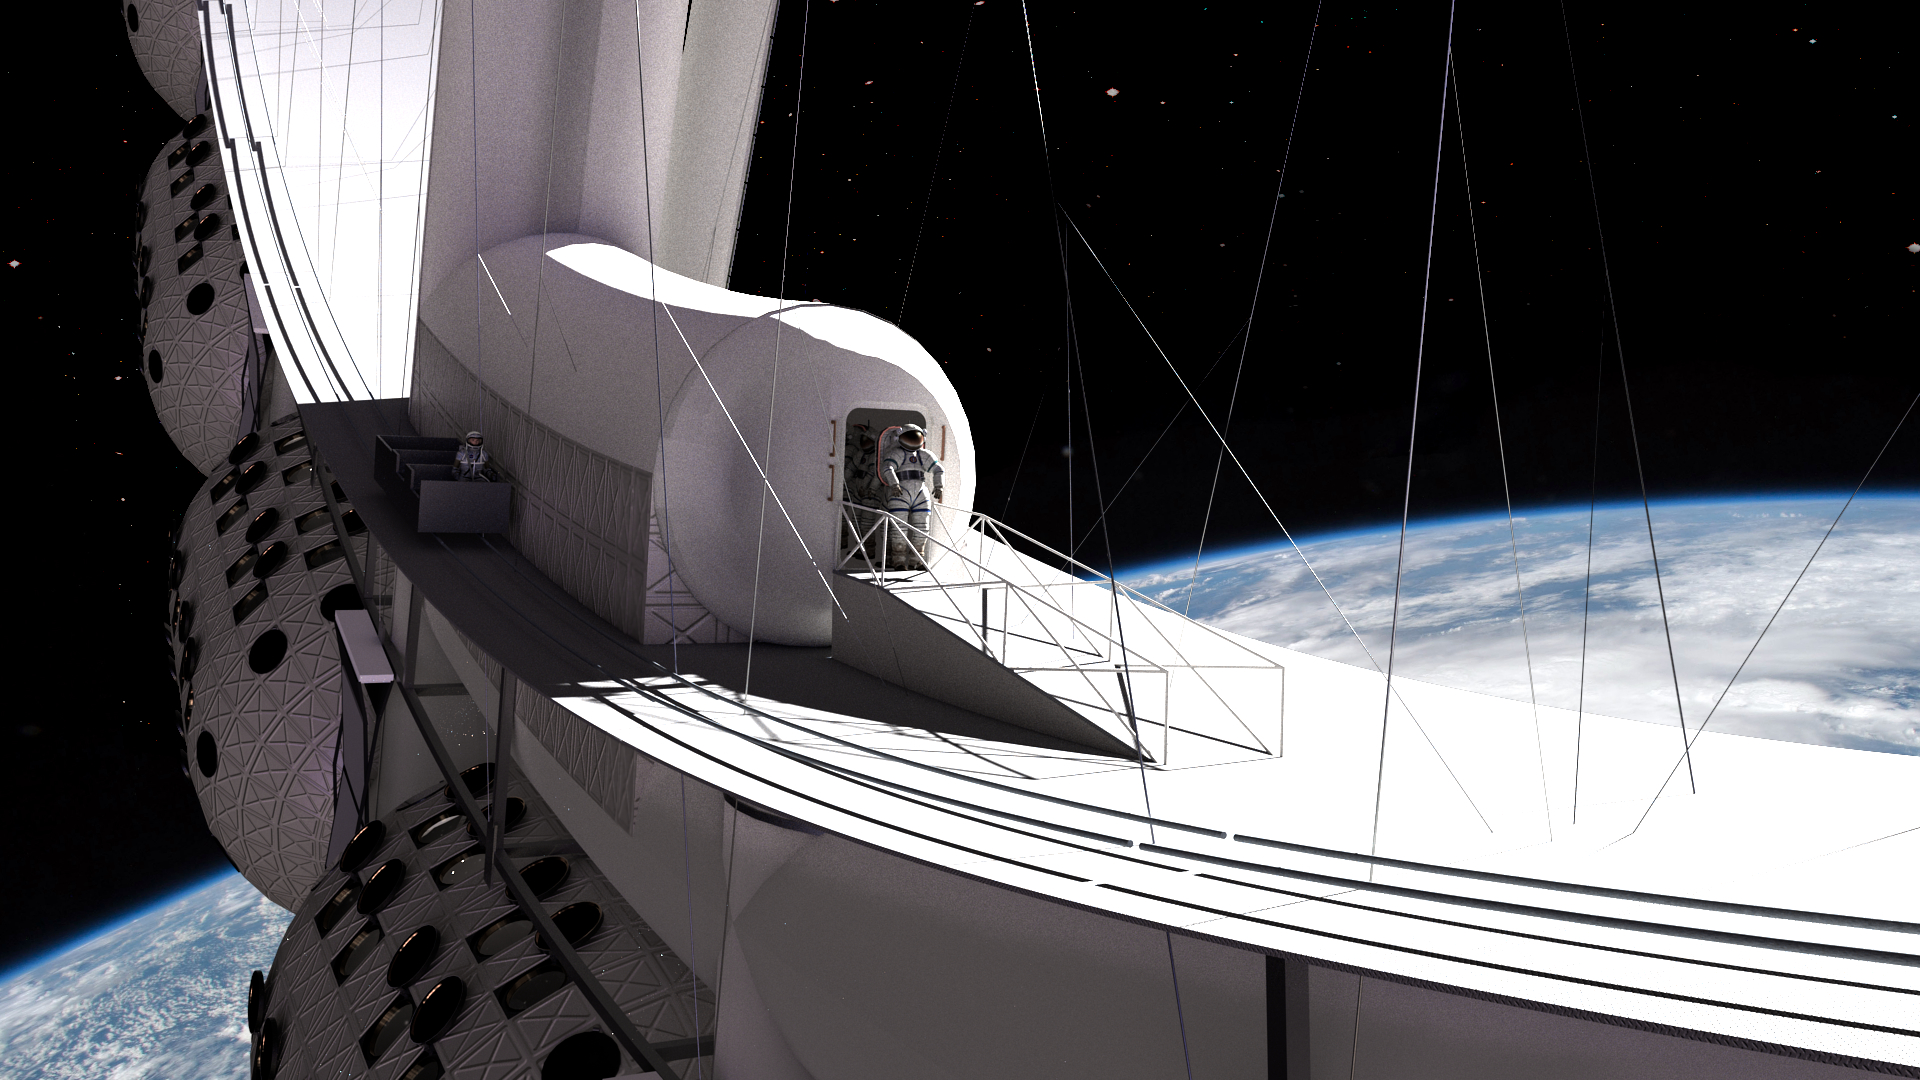 Orbital Assembly Voyager Station